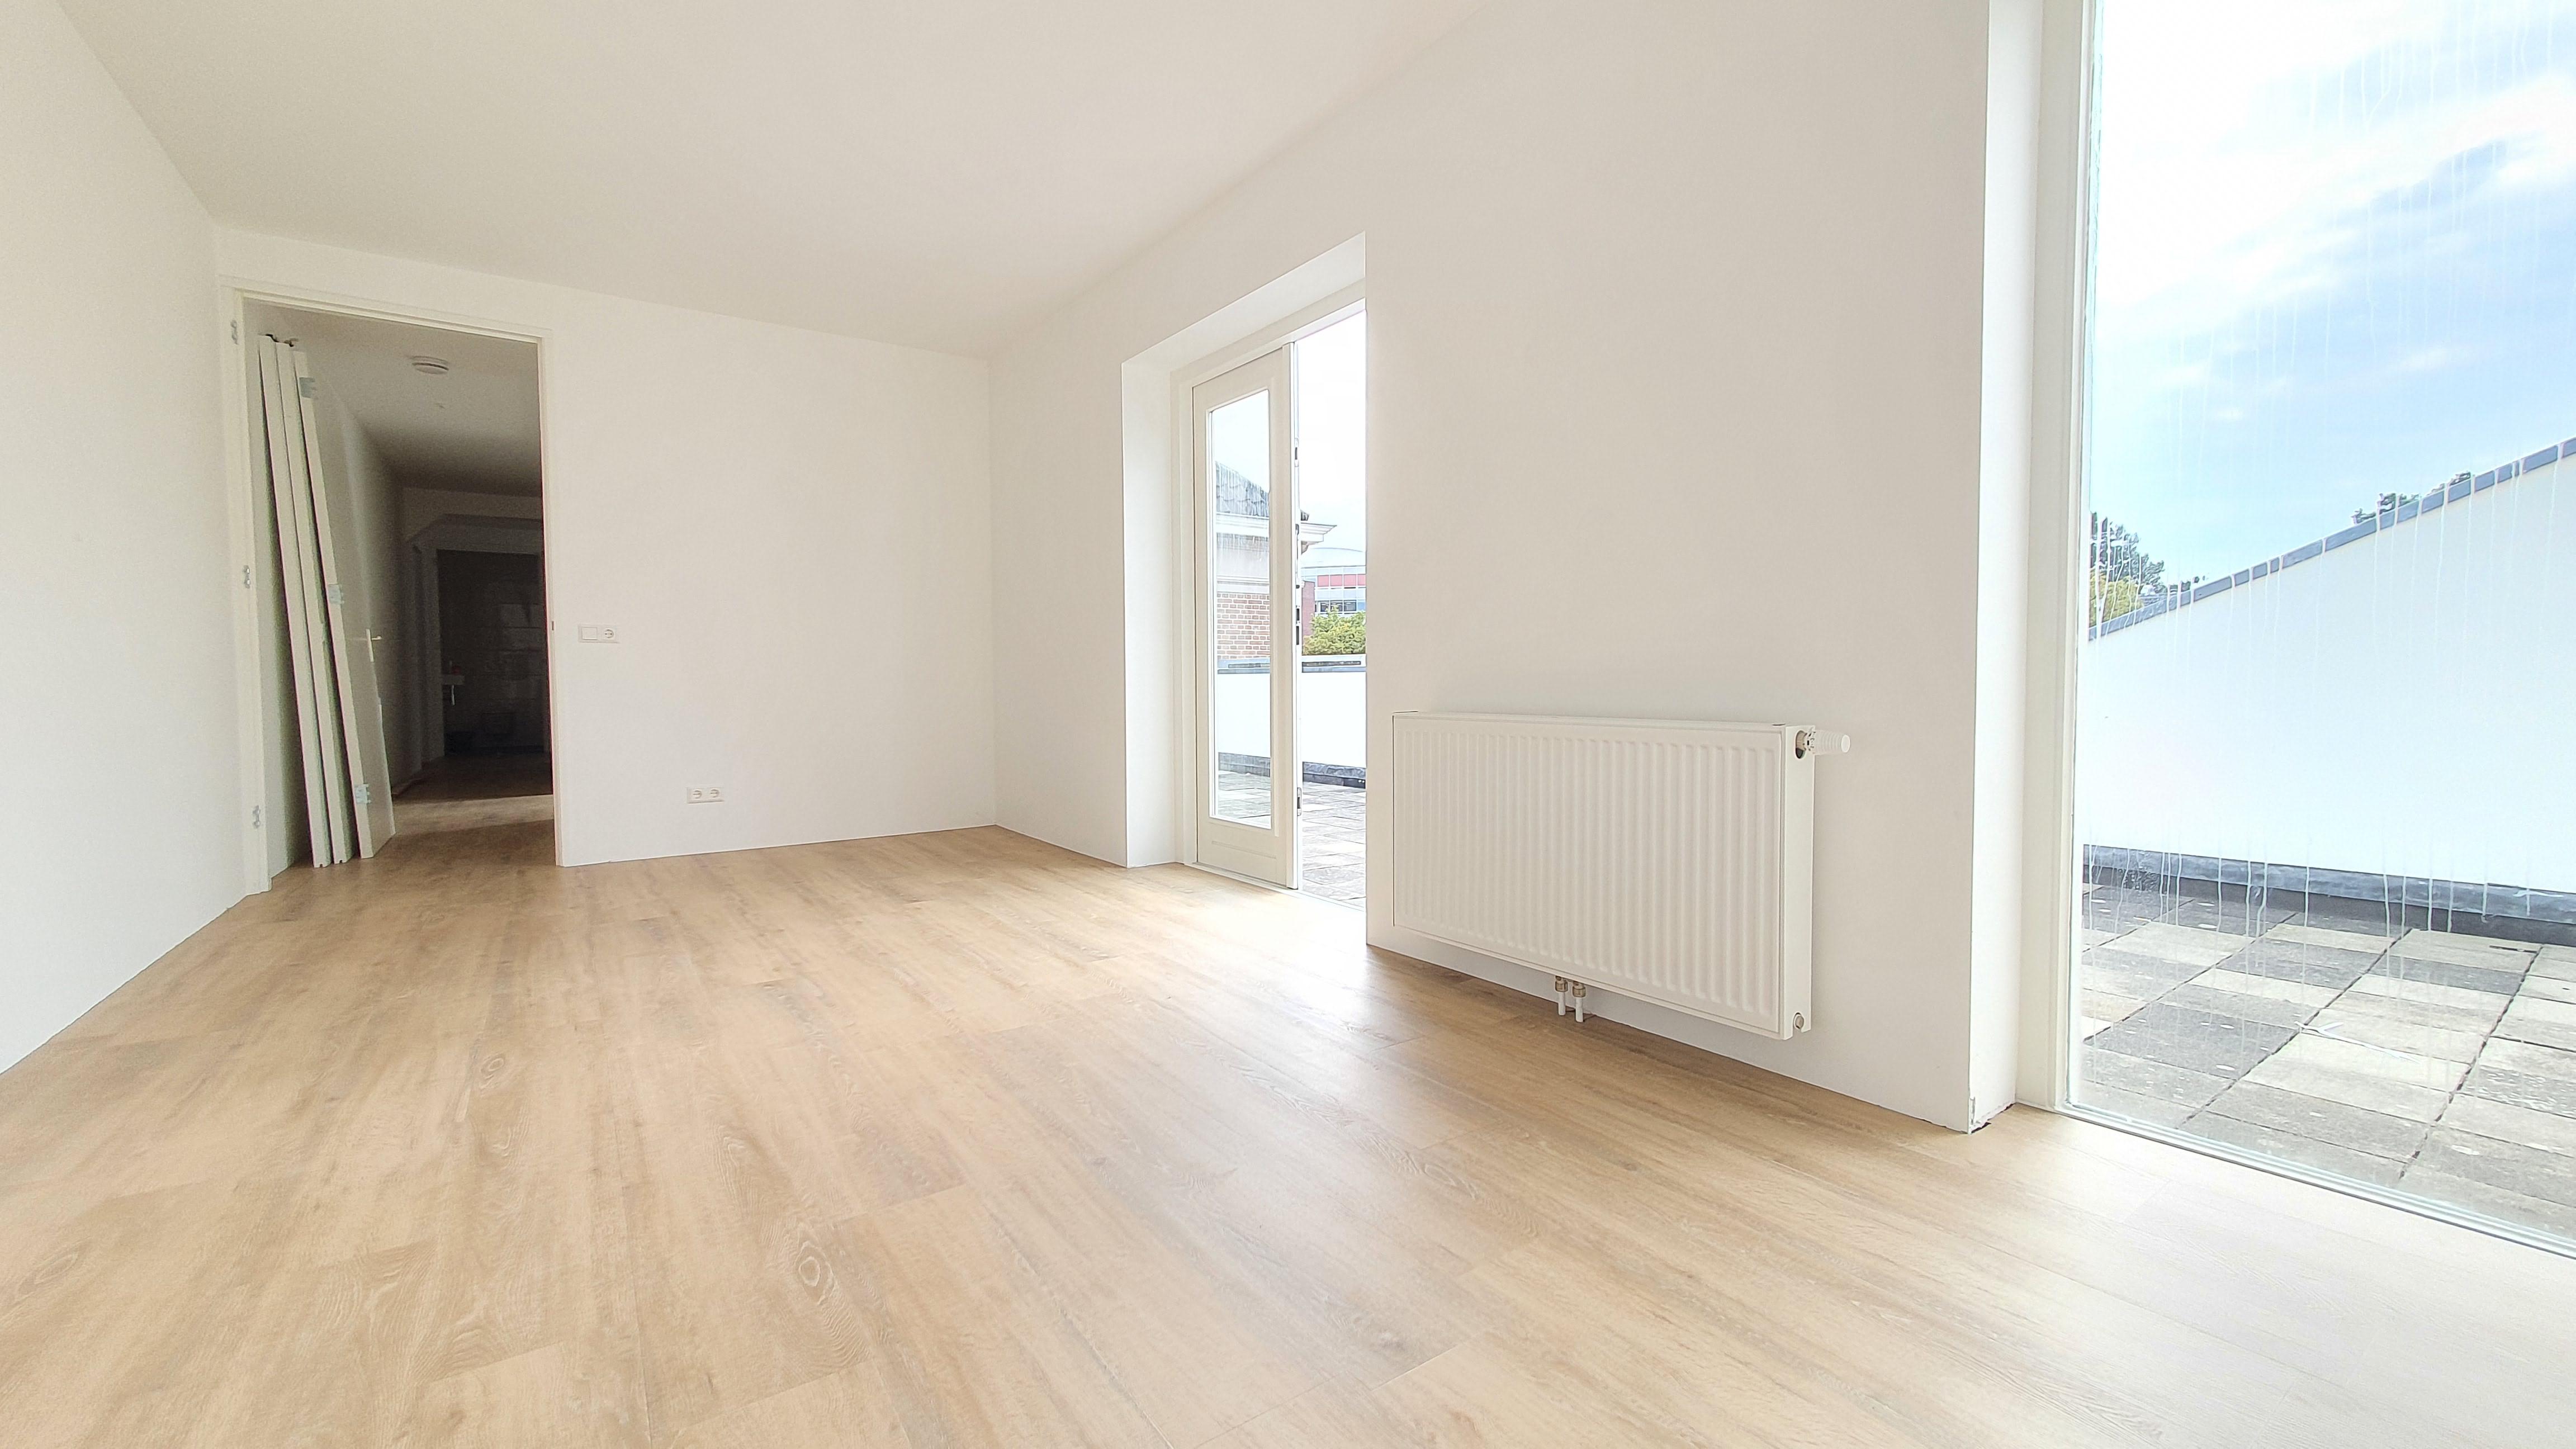 Te huur: Appartement Achter de Arnhemse Poortwal, Amersfoort - 9